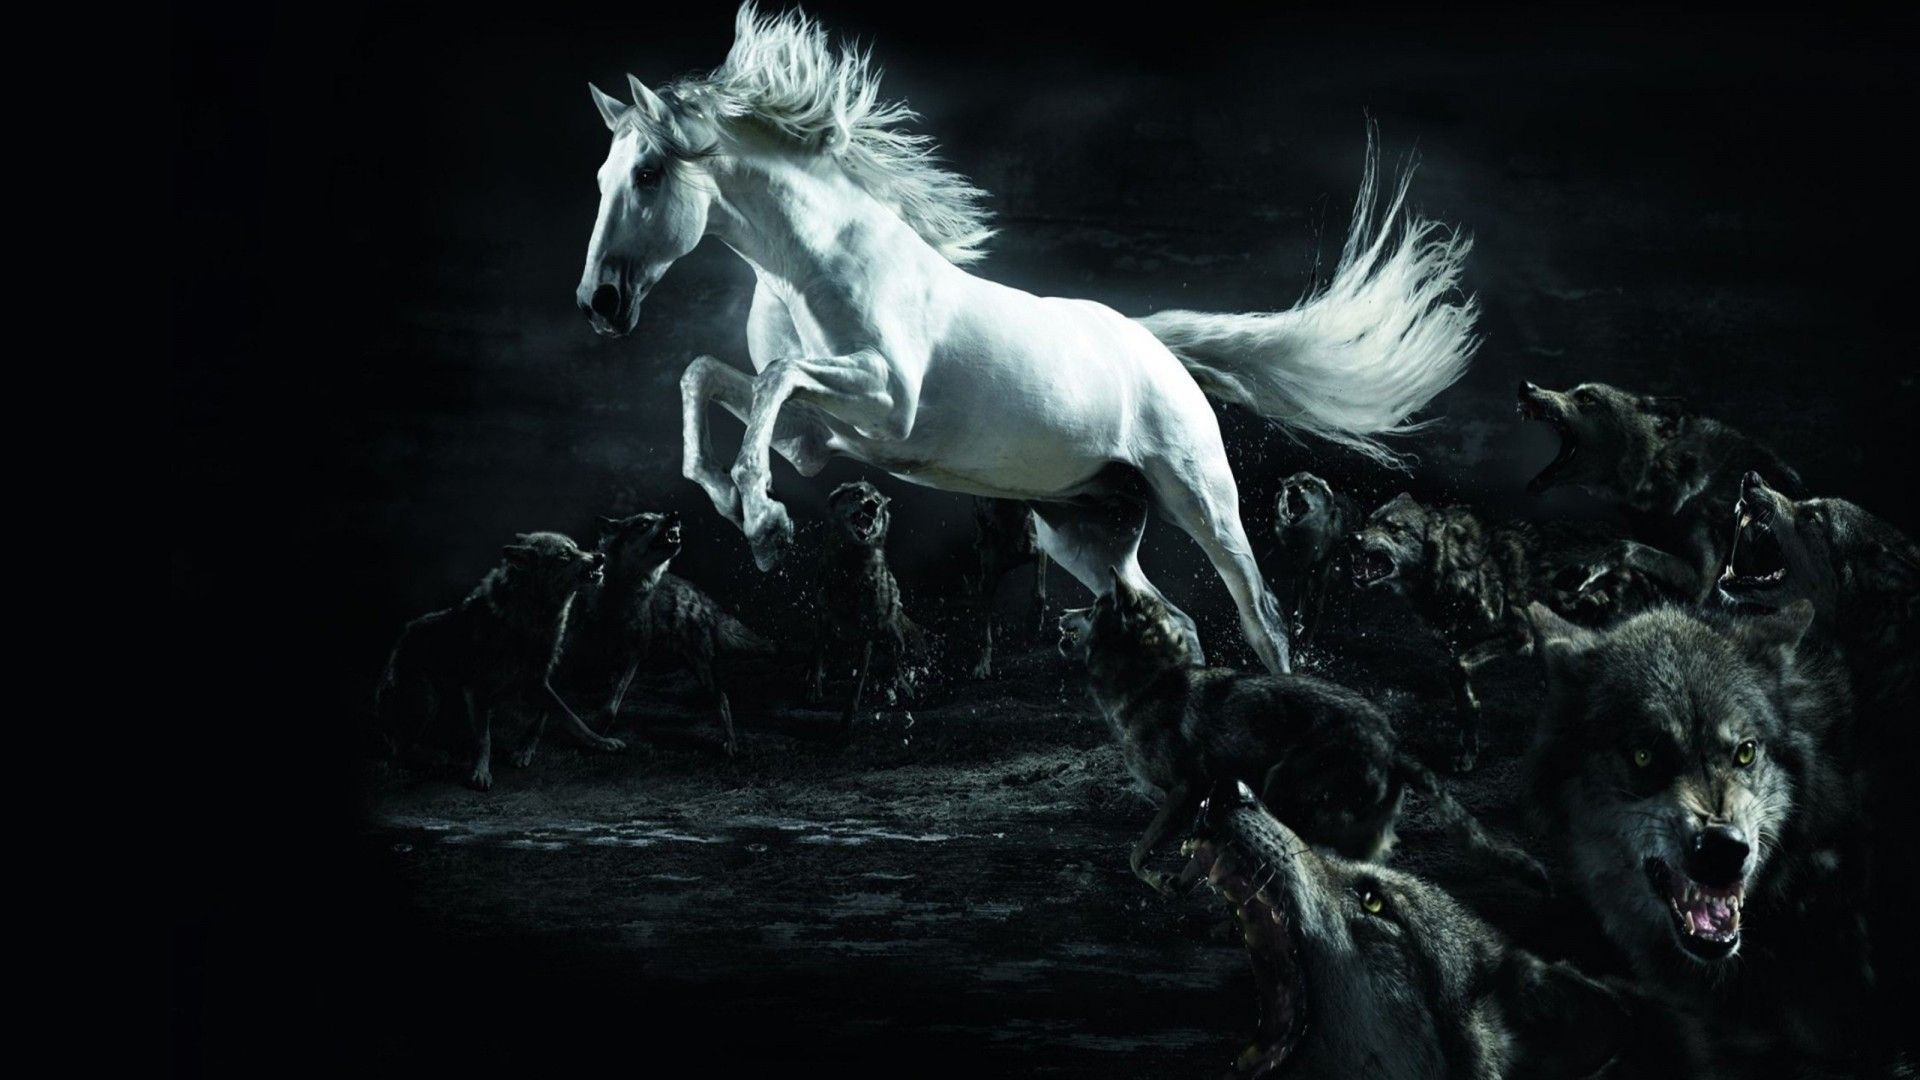 Simple Wallpaper Horse Ultra Hd - 68bdadab129eac59480fb6fe64303183  Image_628821.jpg